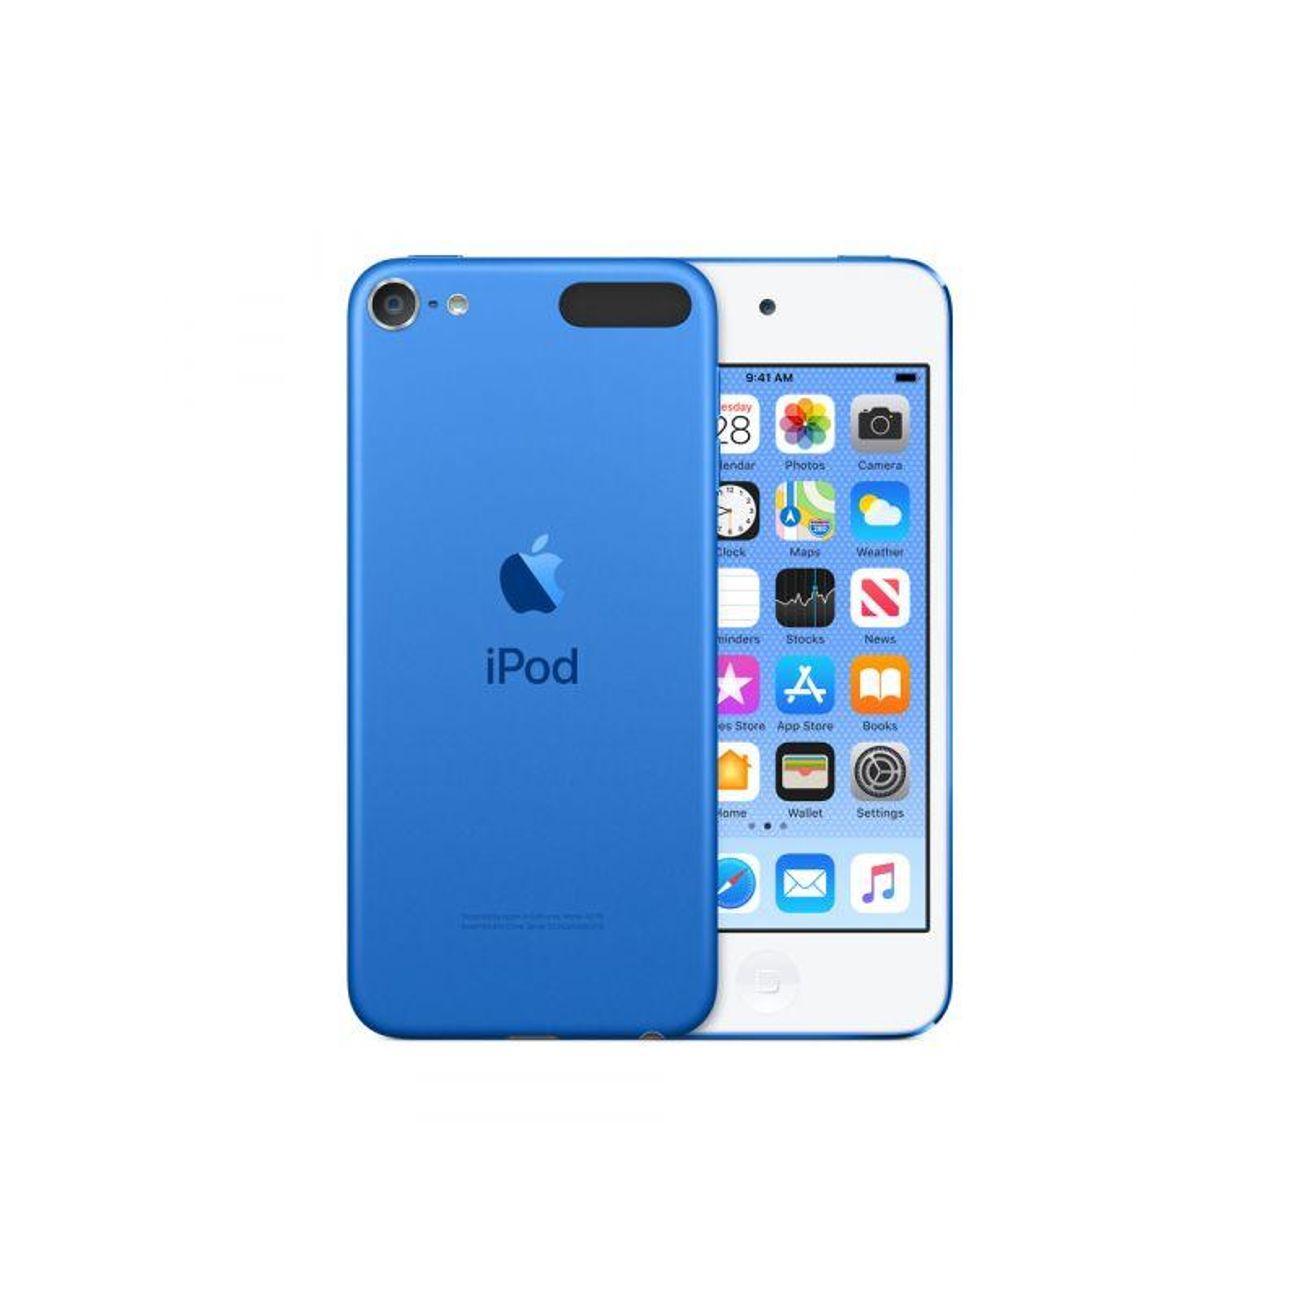 NO NAME Apple iPod touch Blau 32GB 7.Gen. MVHU2FD/A